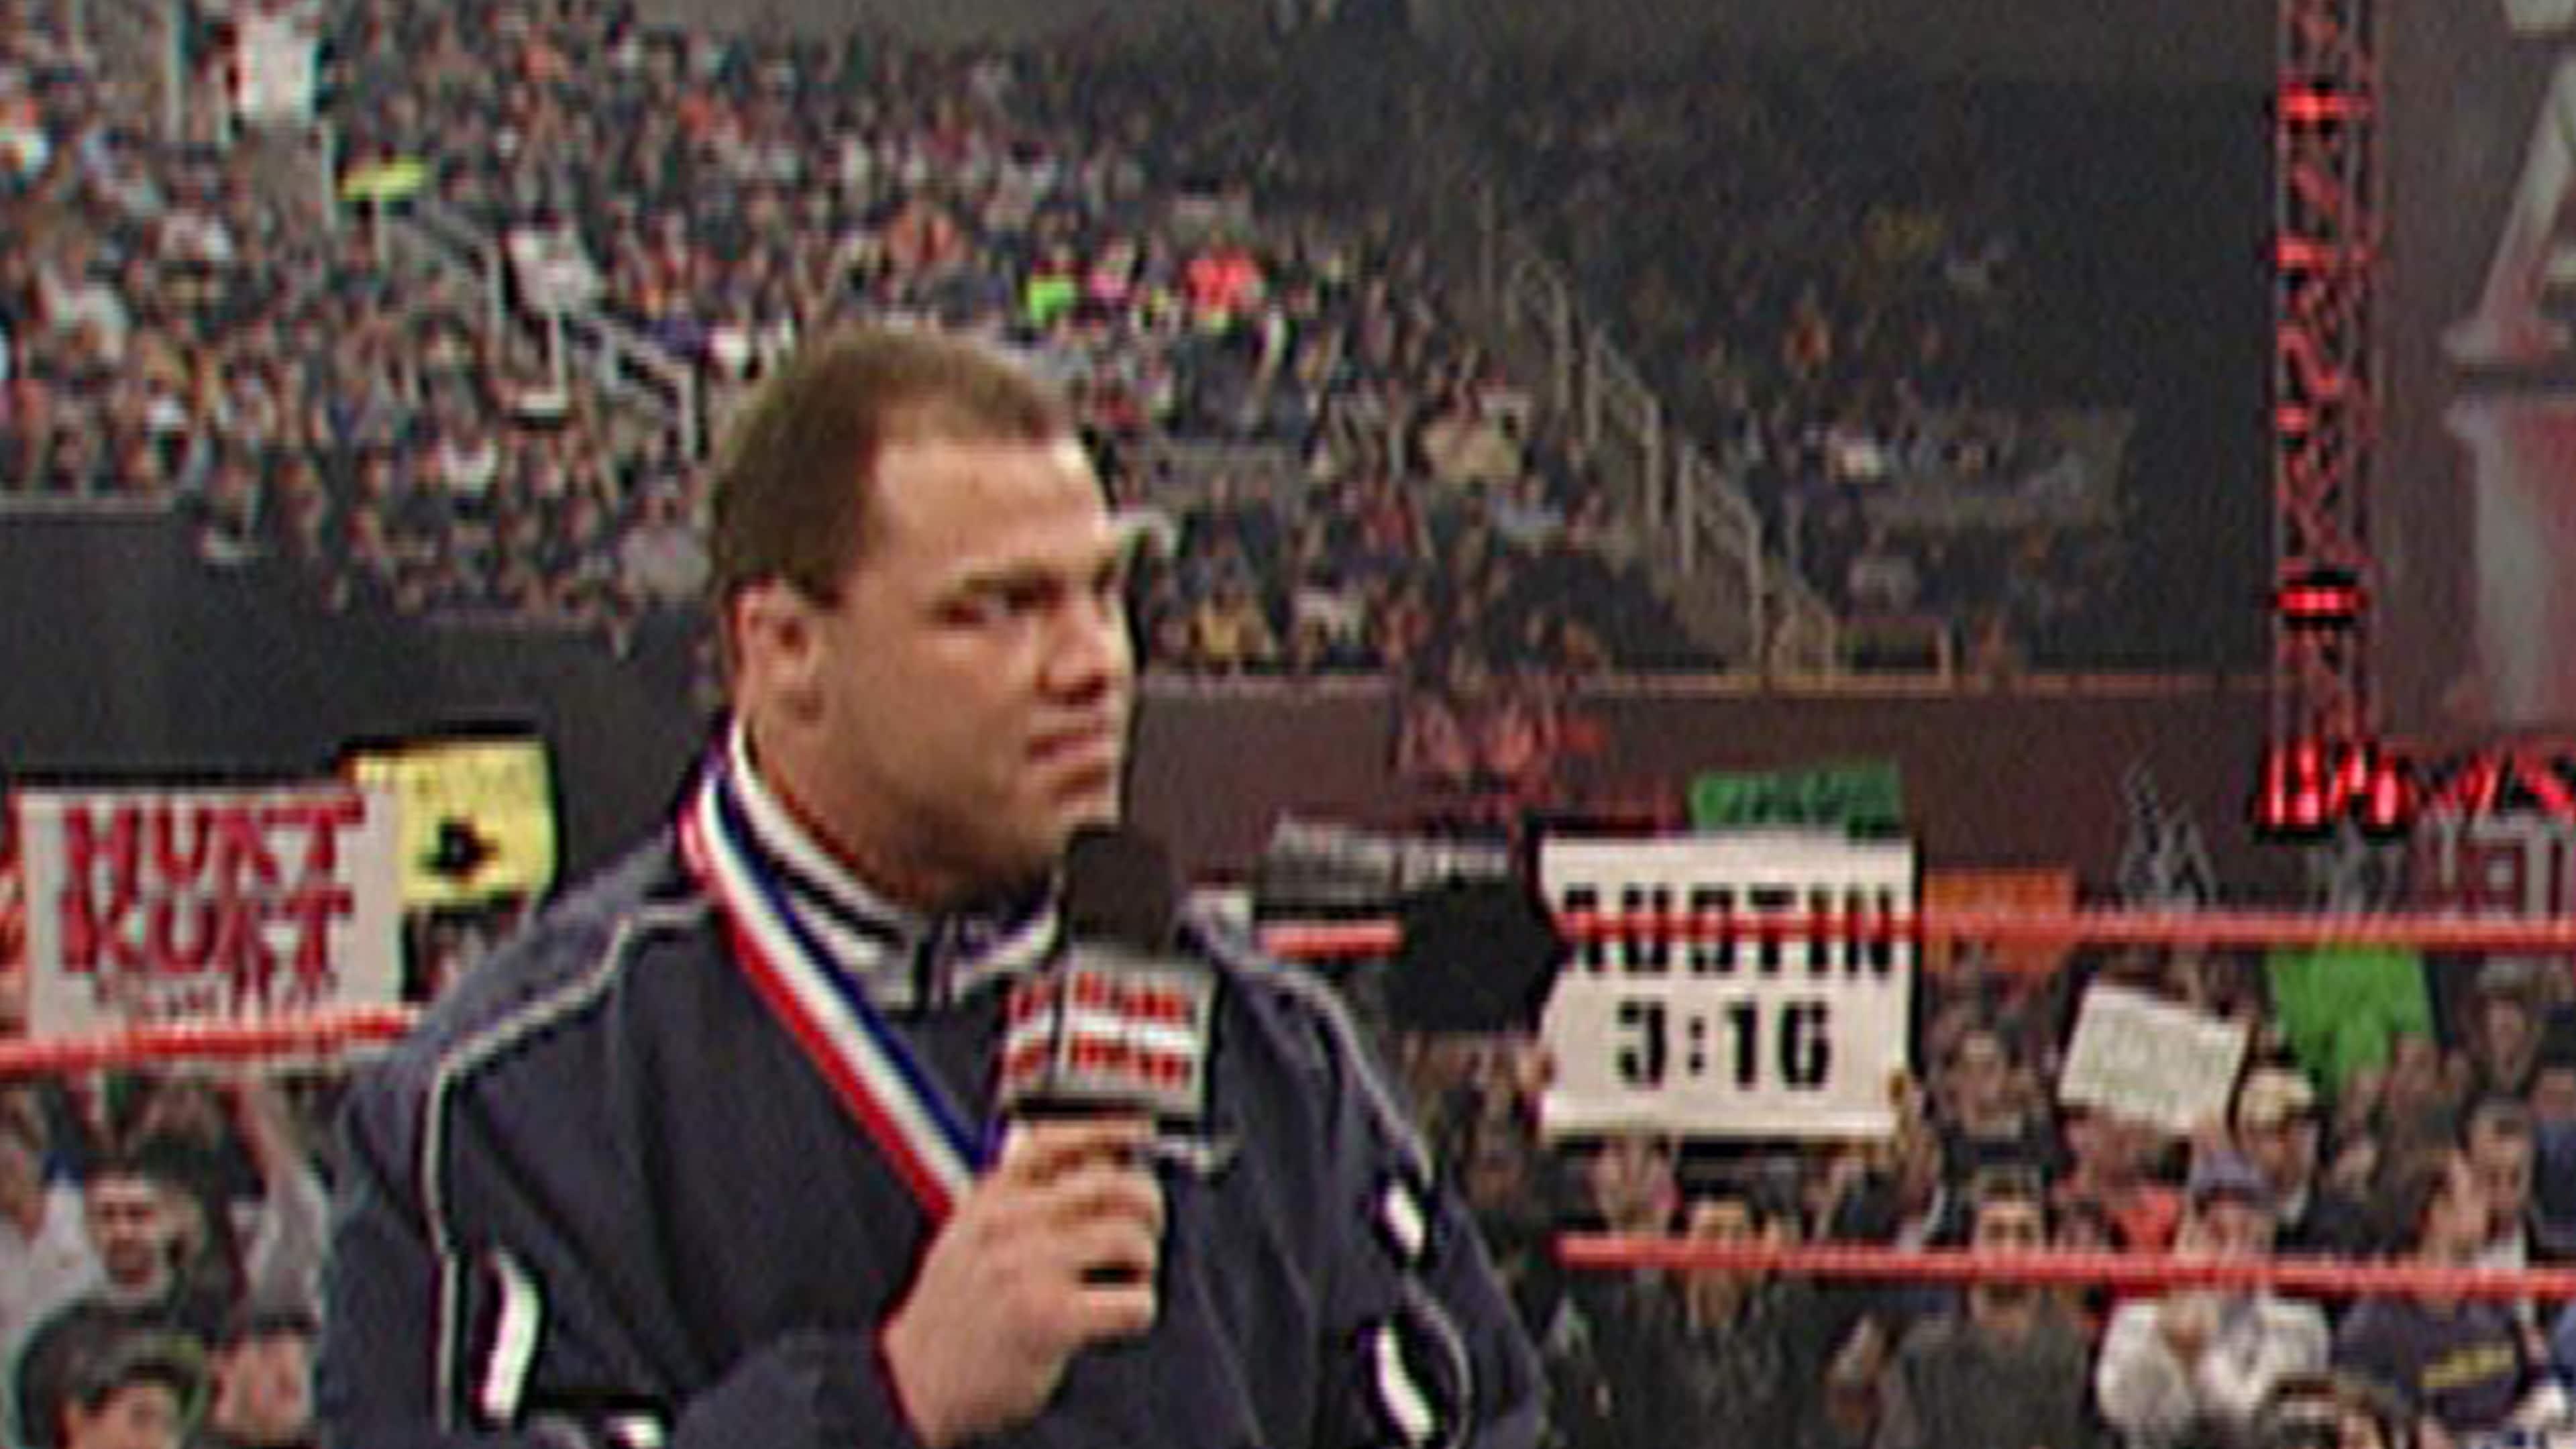 January 8, 2001